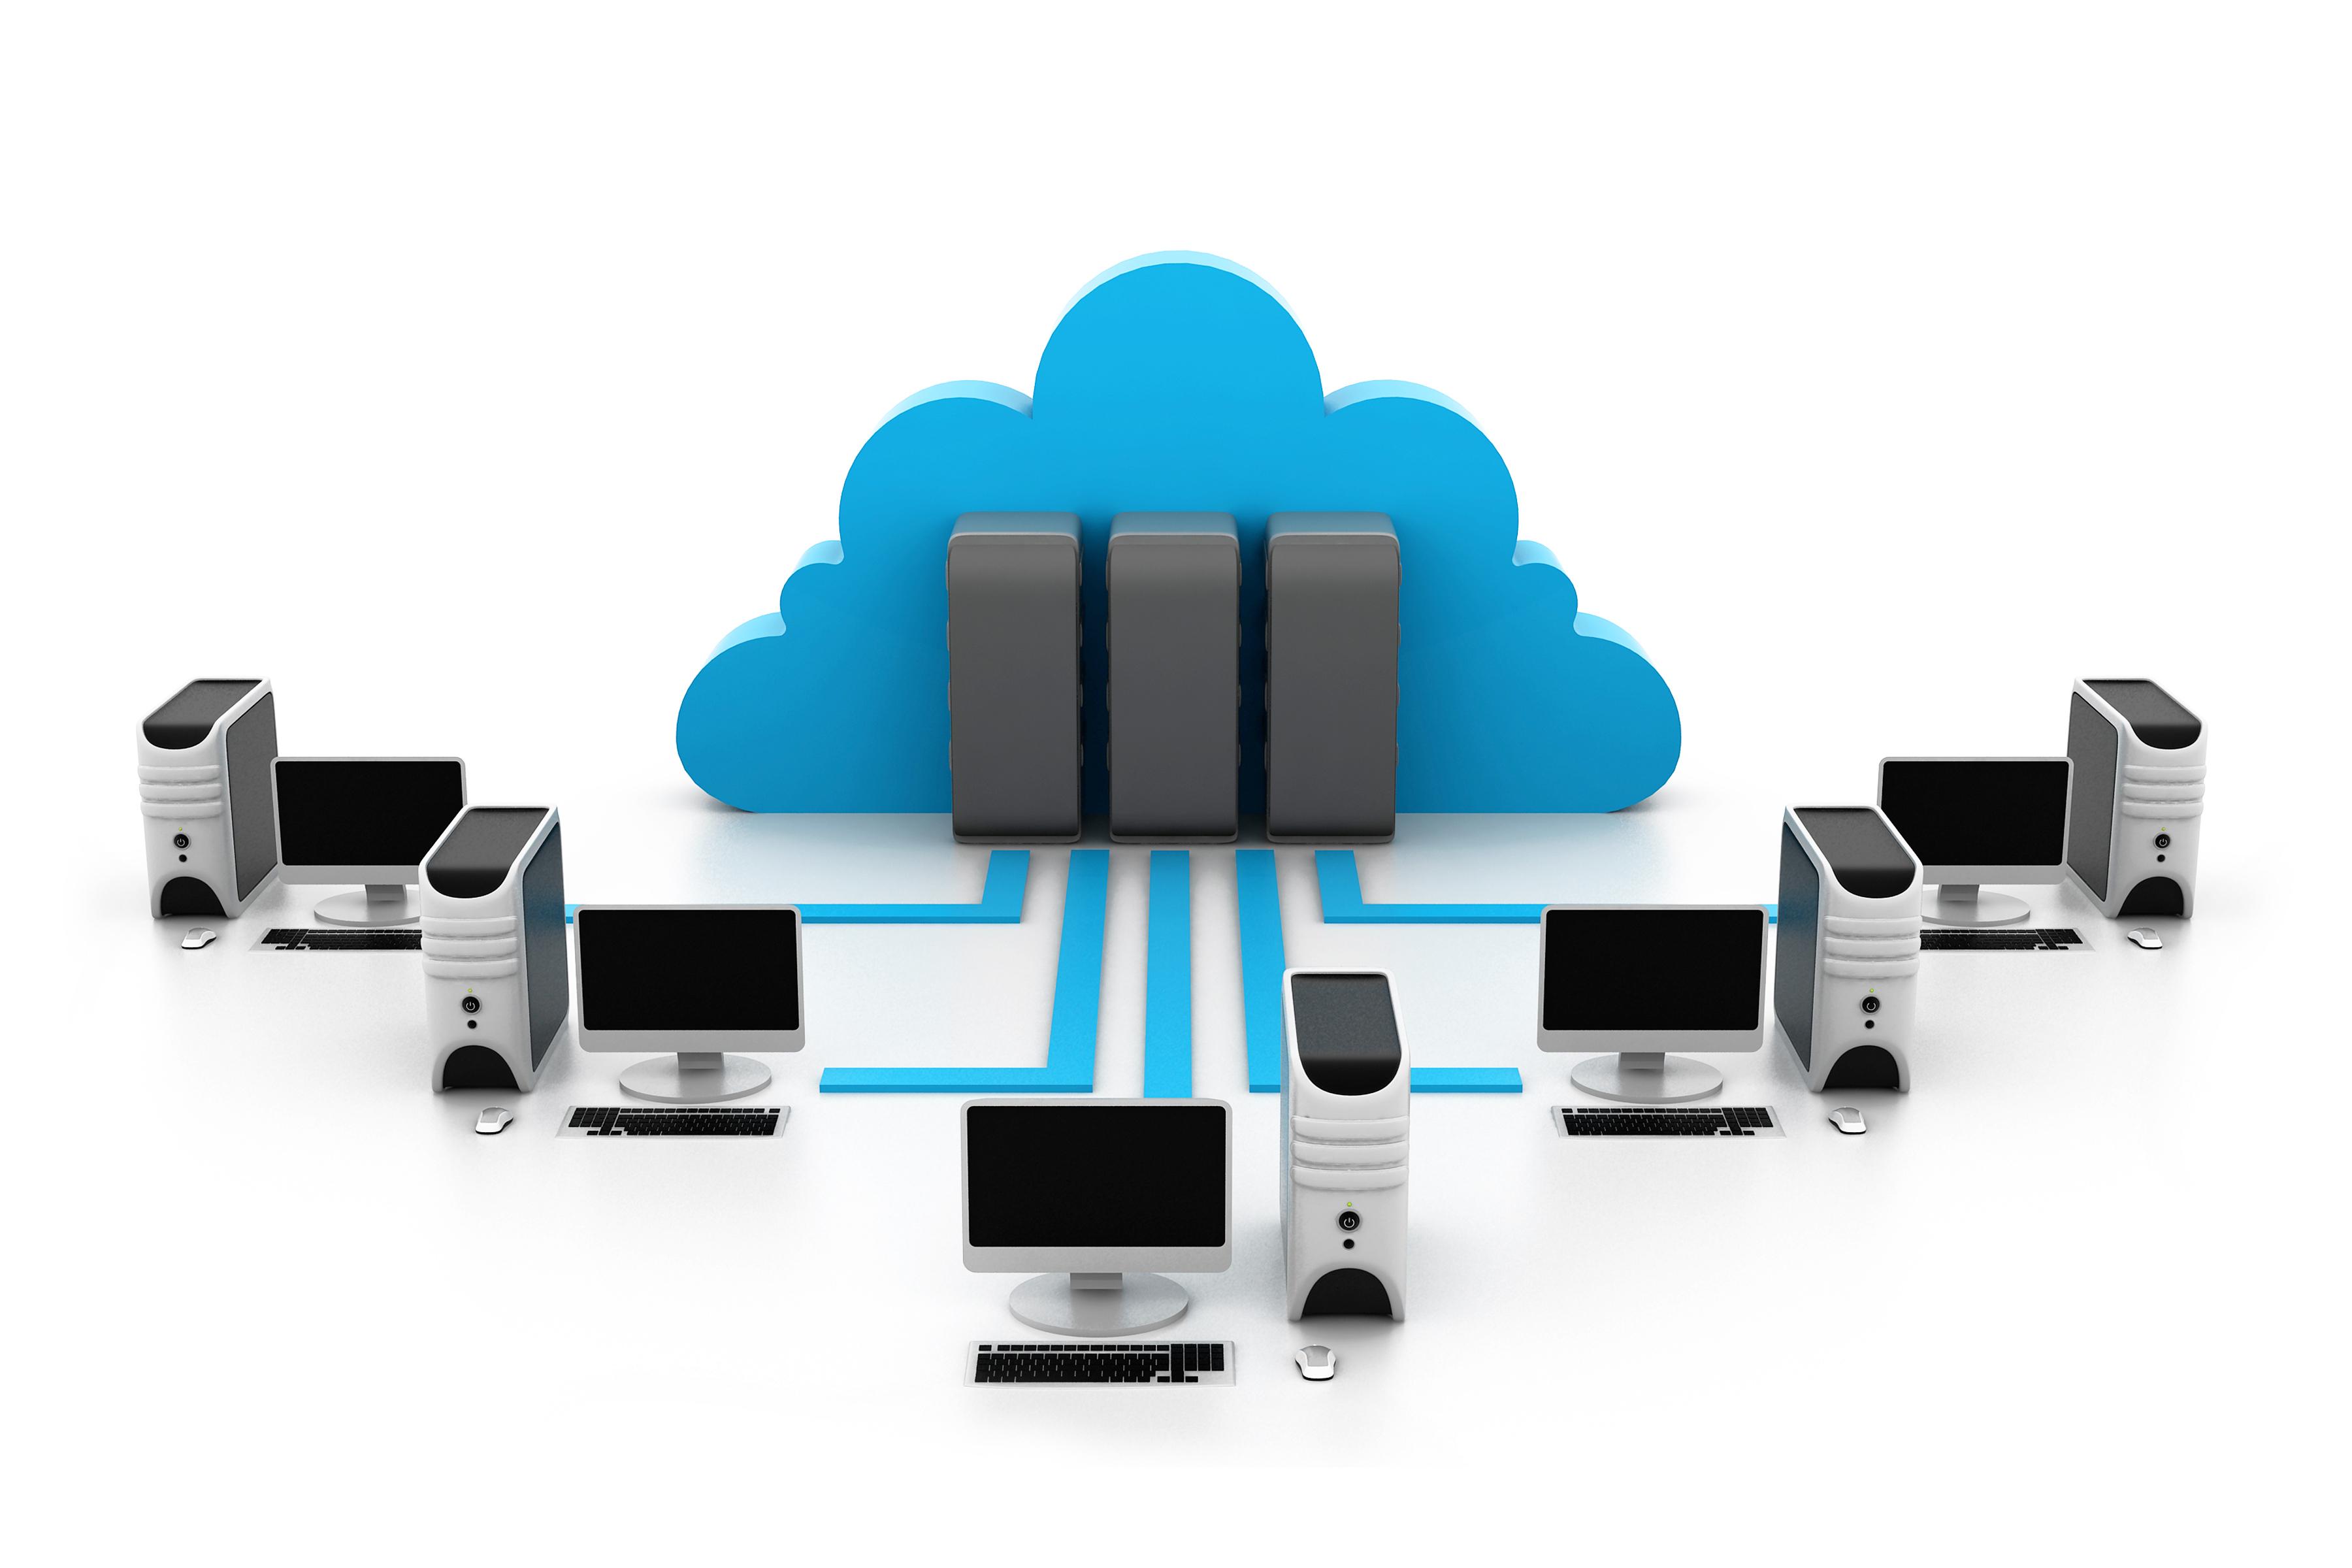 Cloud Compute 2